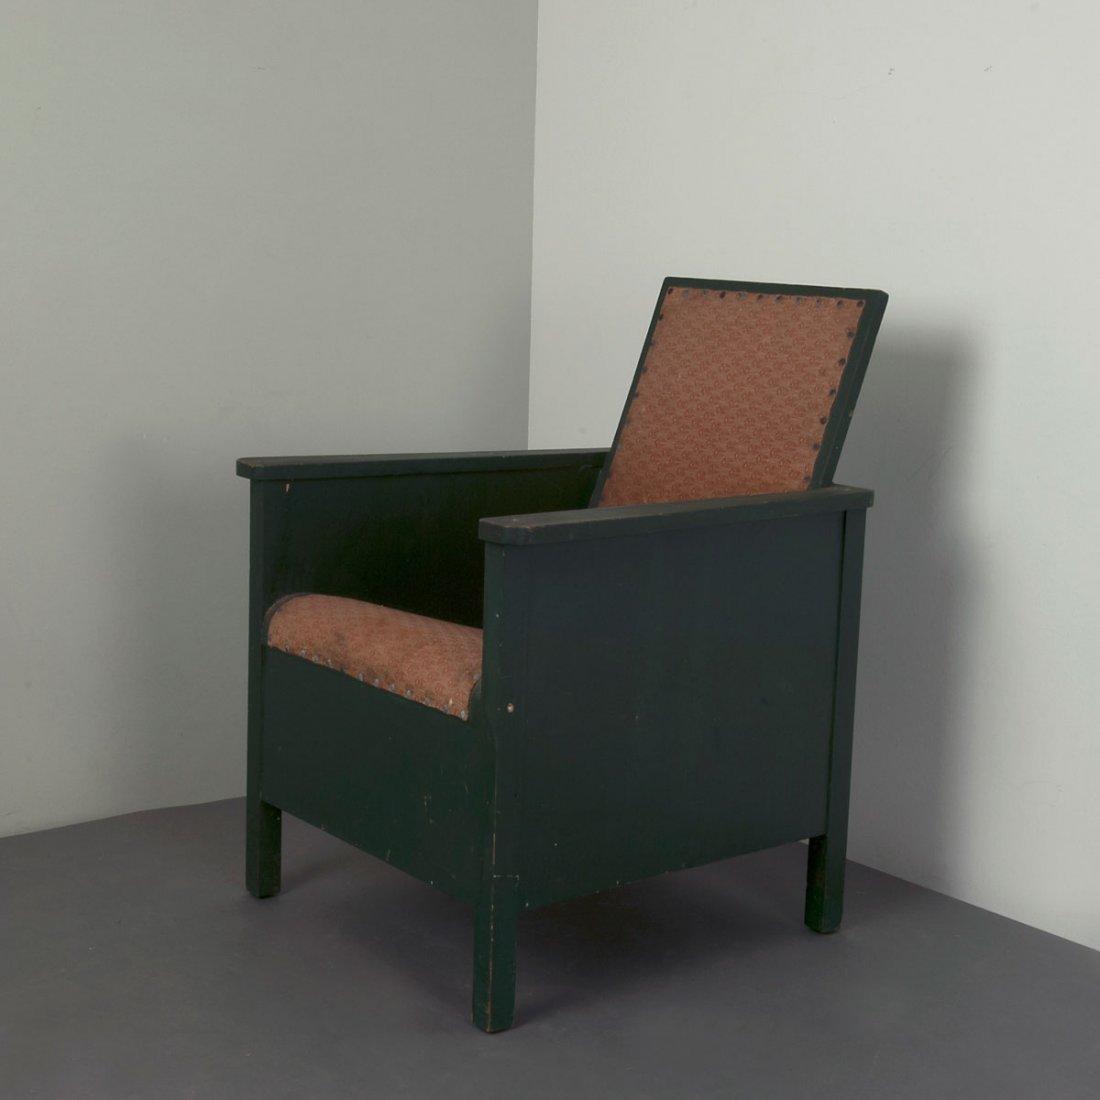 Sweden. Prototype easy chair, 1920/30s. H. 88 x 66 x 67